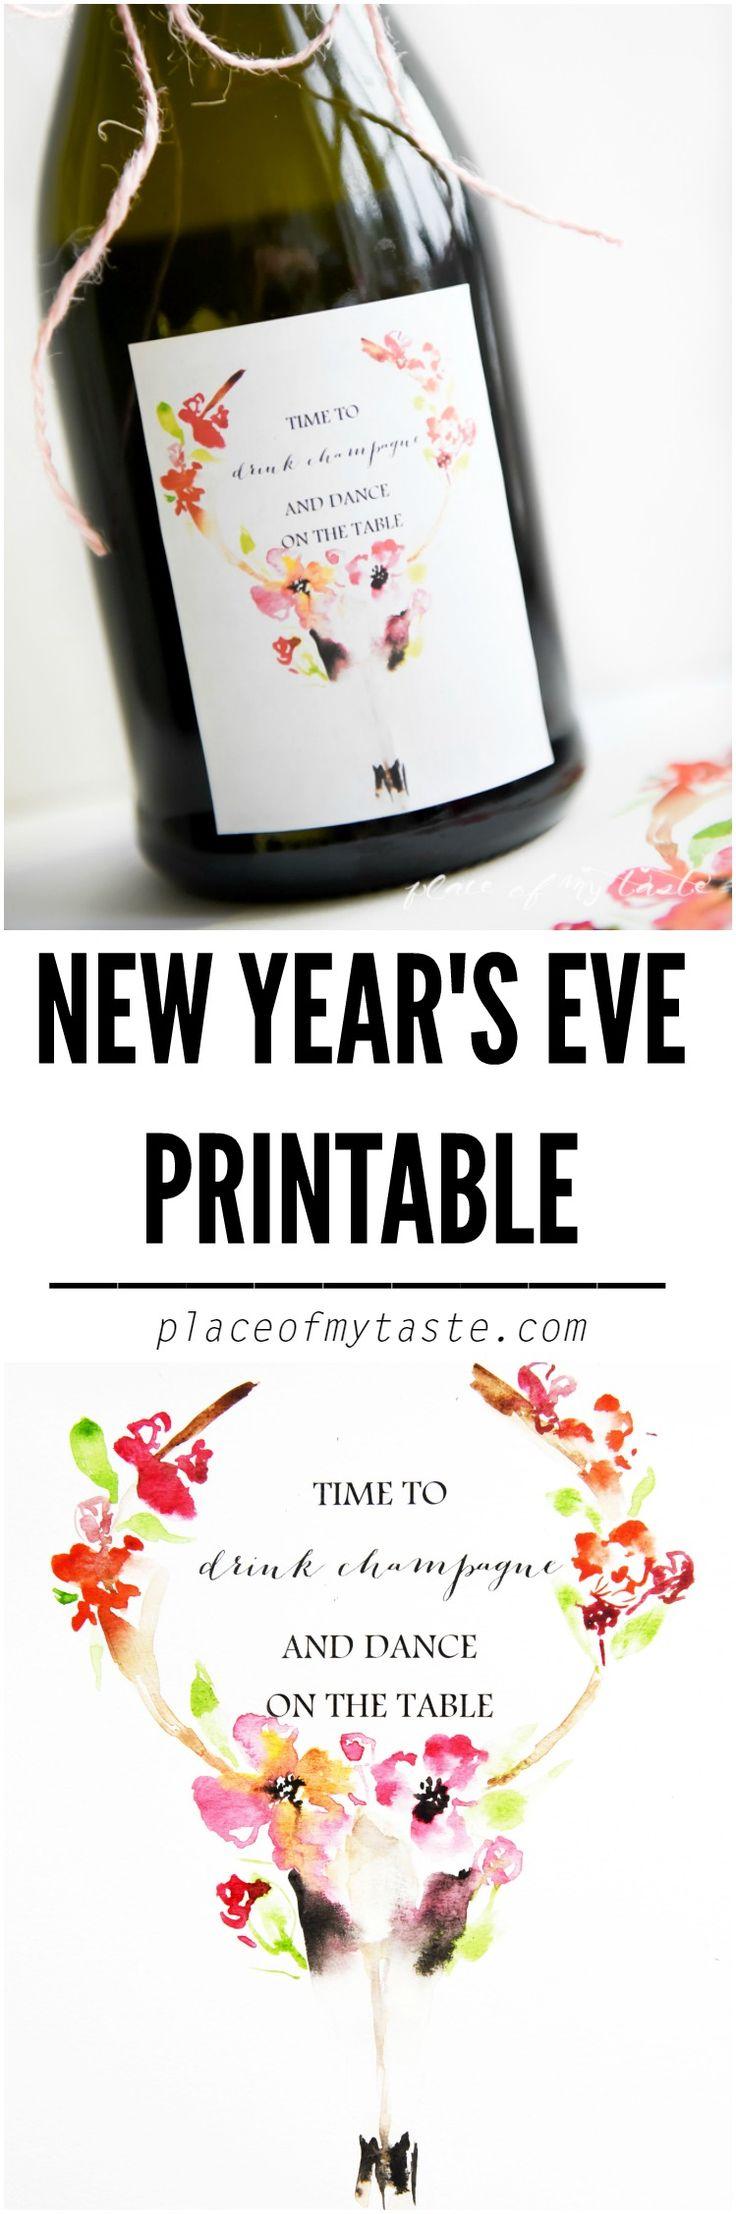 NEW YEAR'S EVE PRINTABLE . Very pretty FREE printable ...